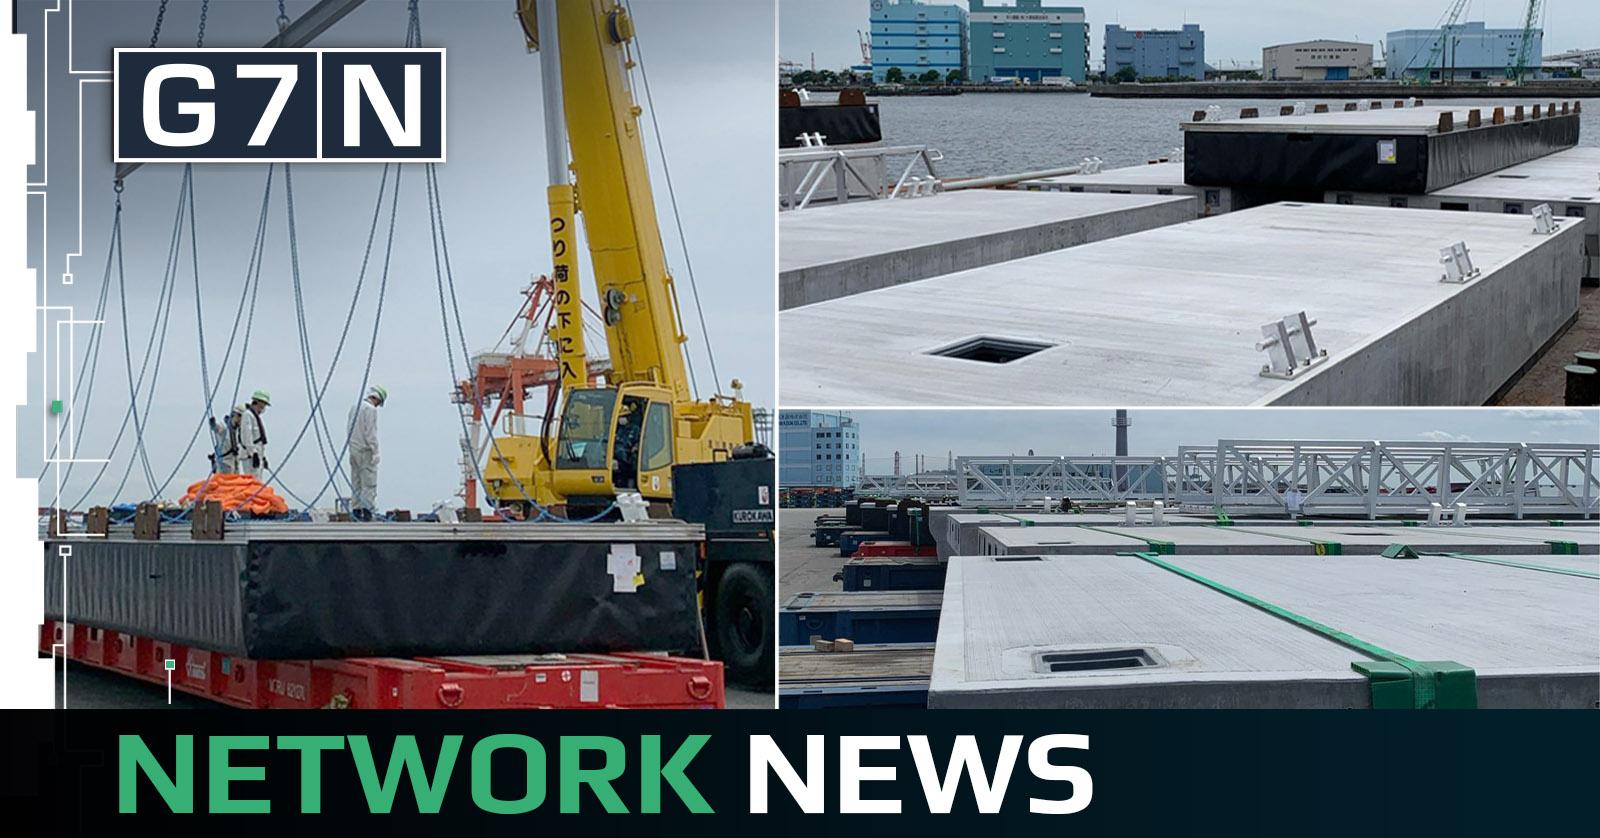 https://newg7dashboard.g7networks.com/news/news__110621_G7N_knot_NEWS.jpg